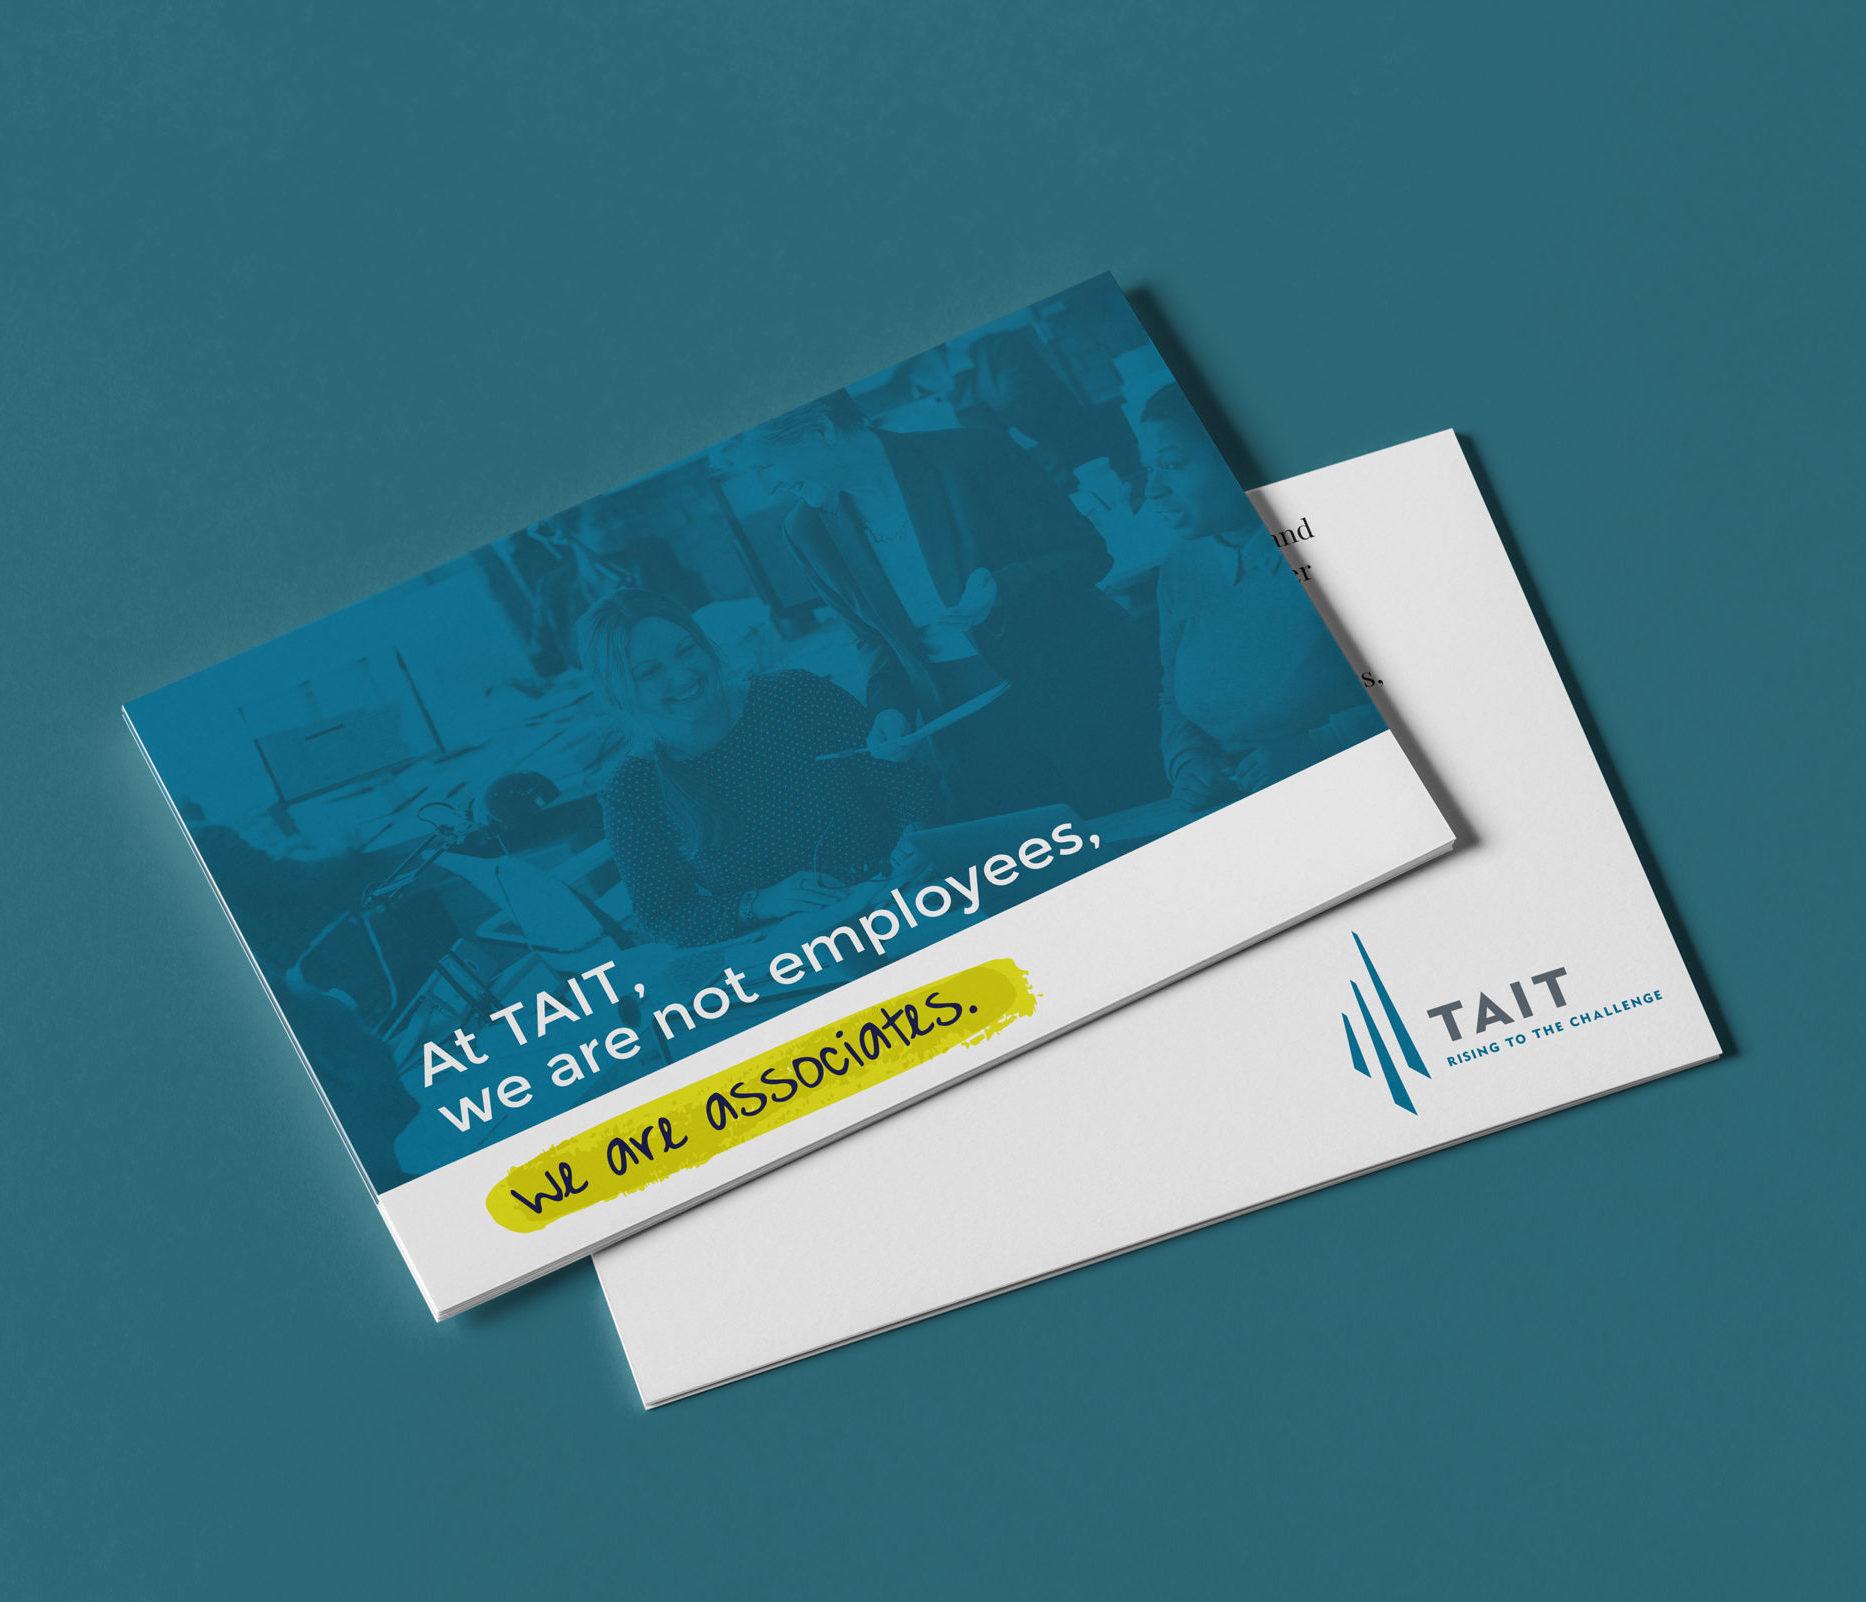 Tait postcard